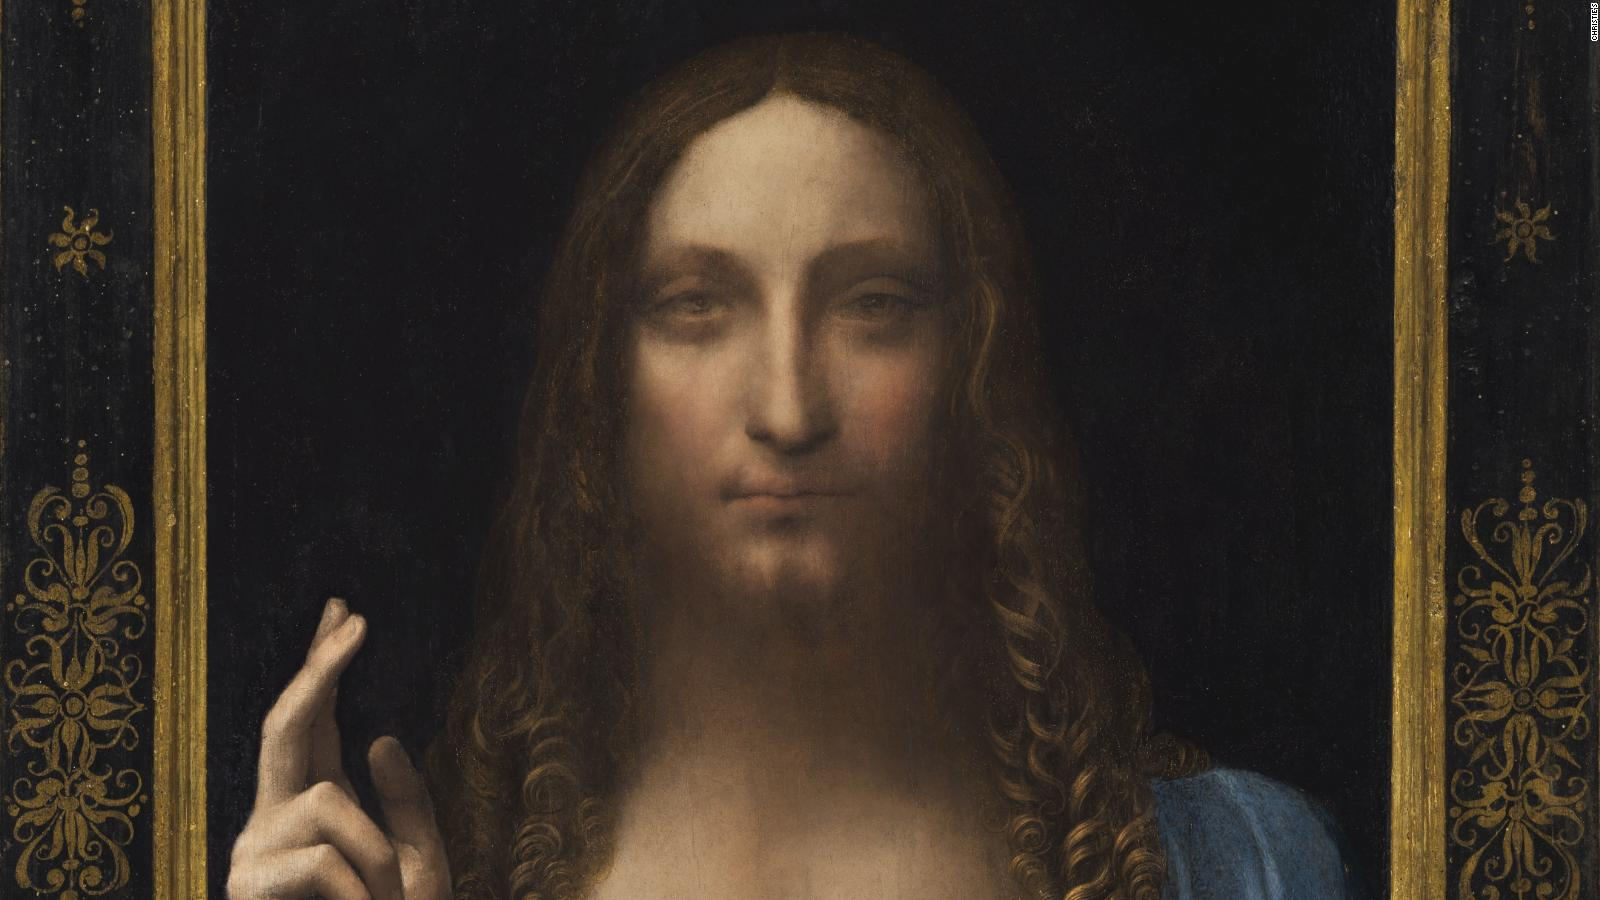 Decorative Arts 100% True Old Hand Painted Renaissance Style Lady Portrait Miniature.signed I Have More